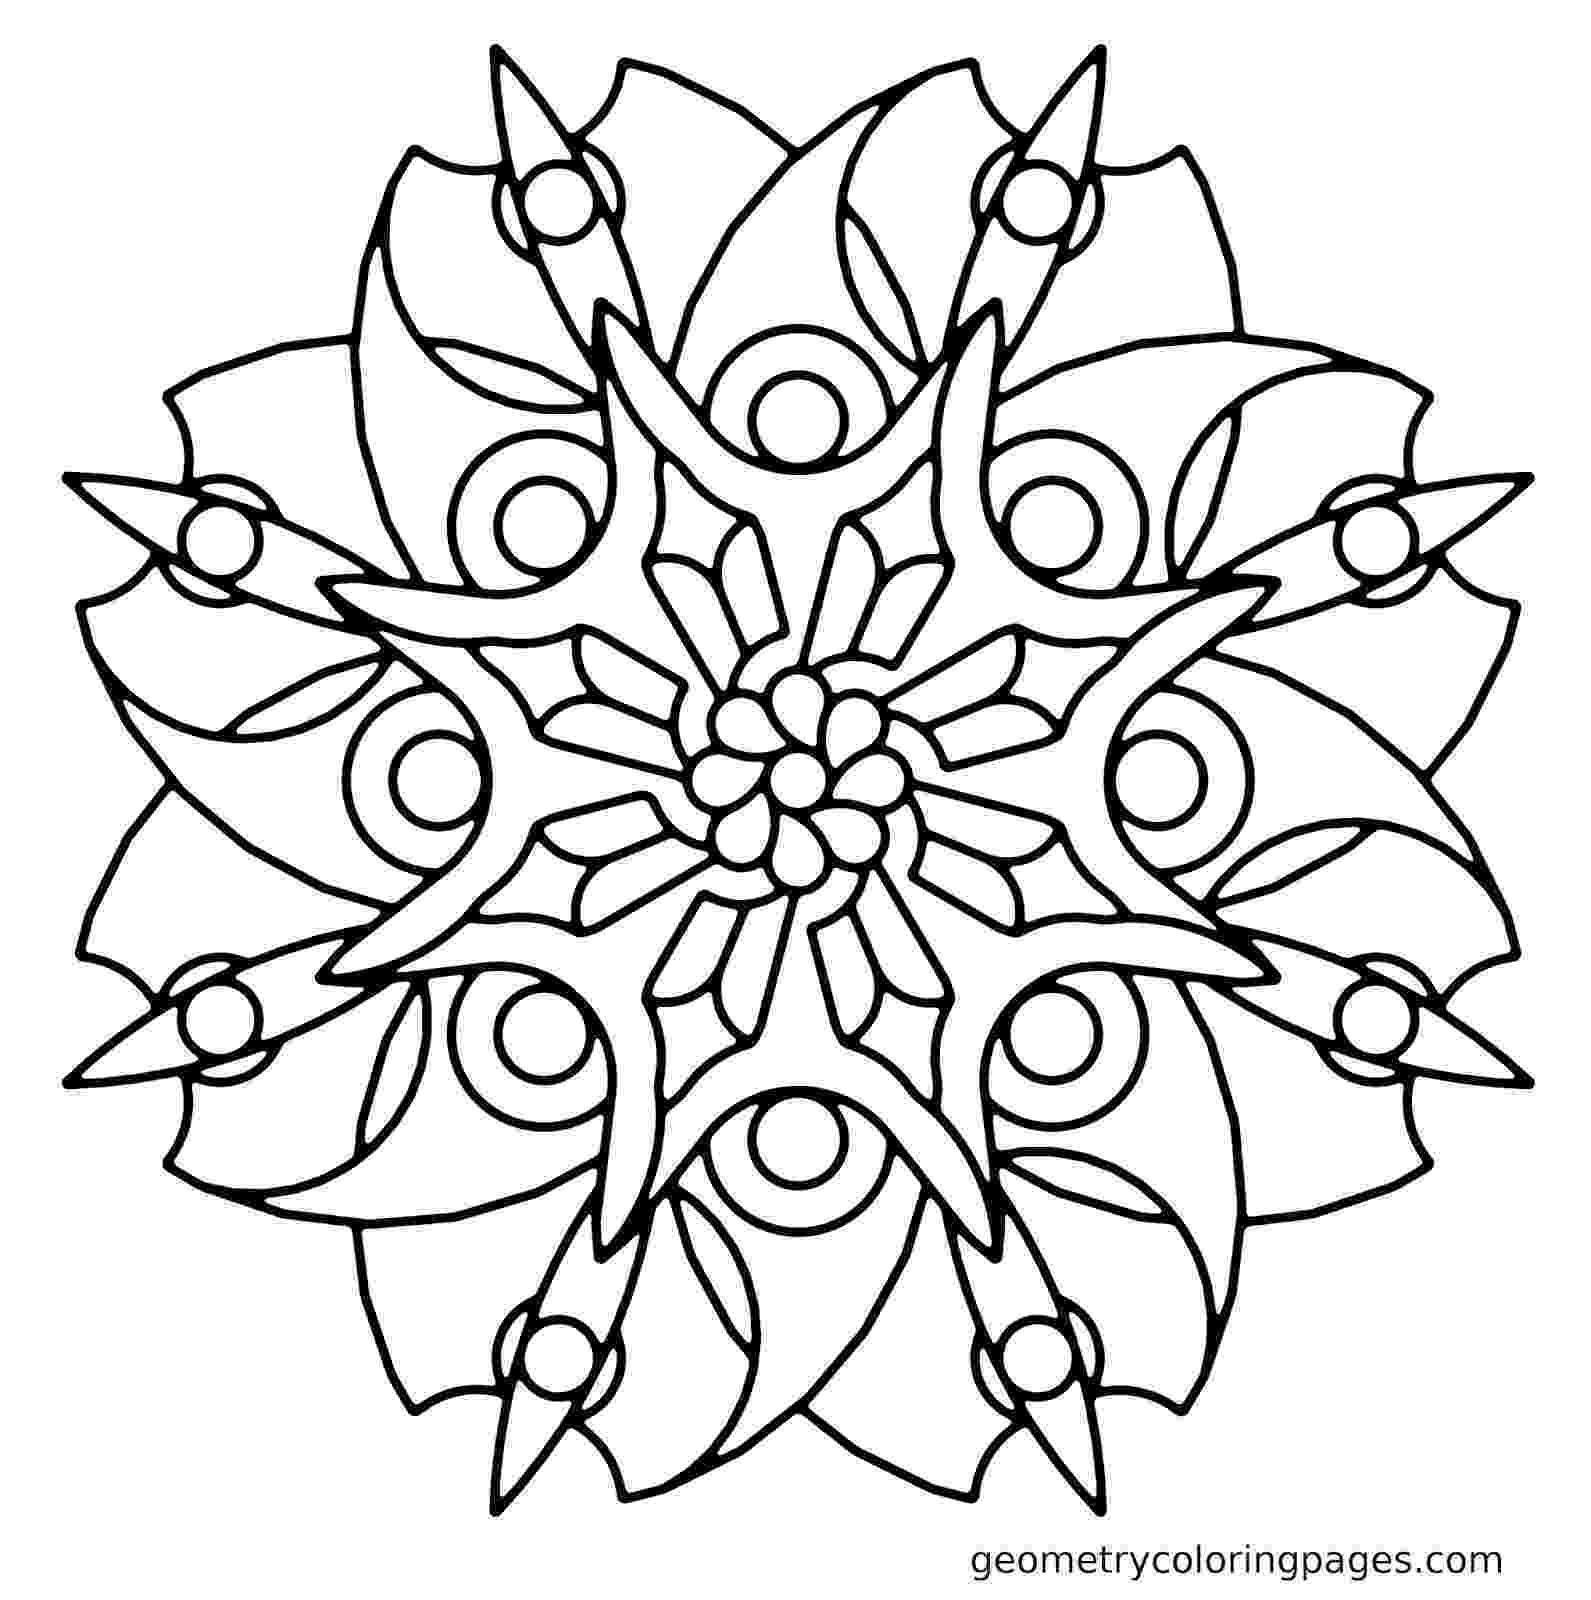 free mandala coloring pages flower mandala coloring page free printable coloring pages coloring mandala free pages